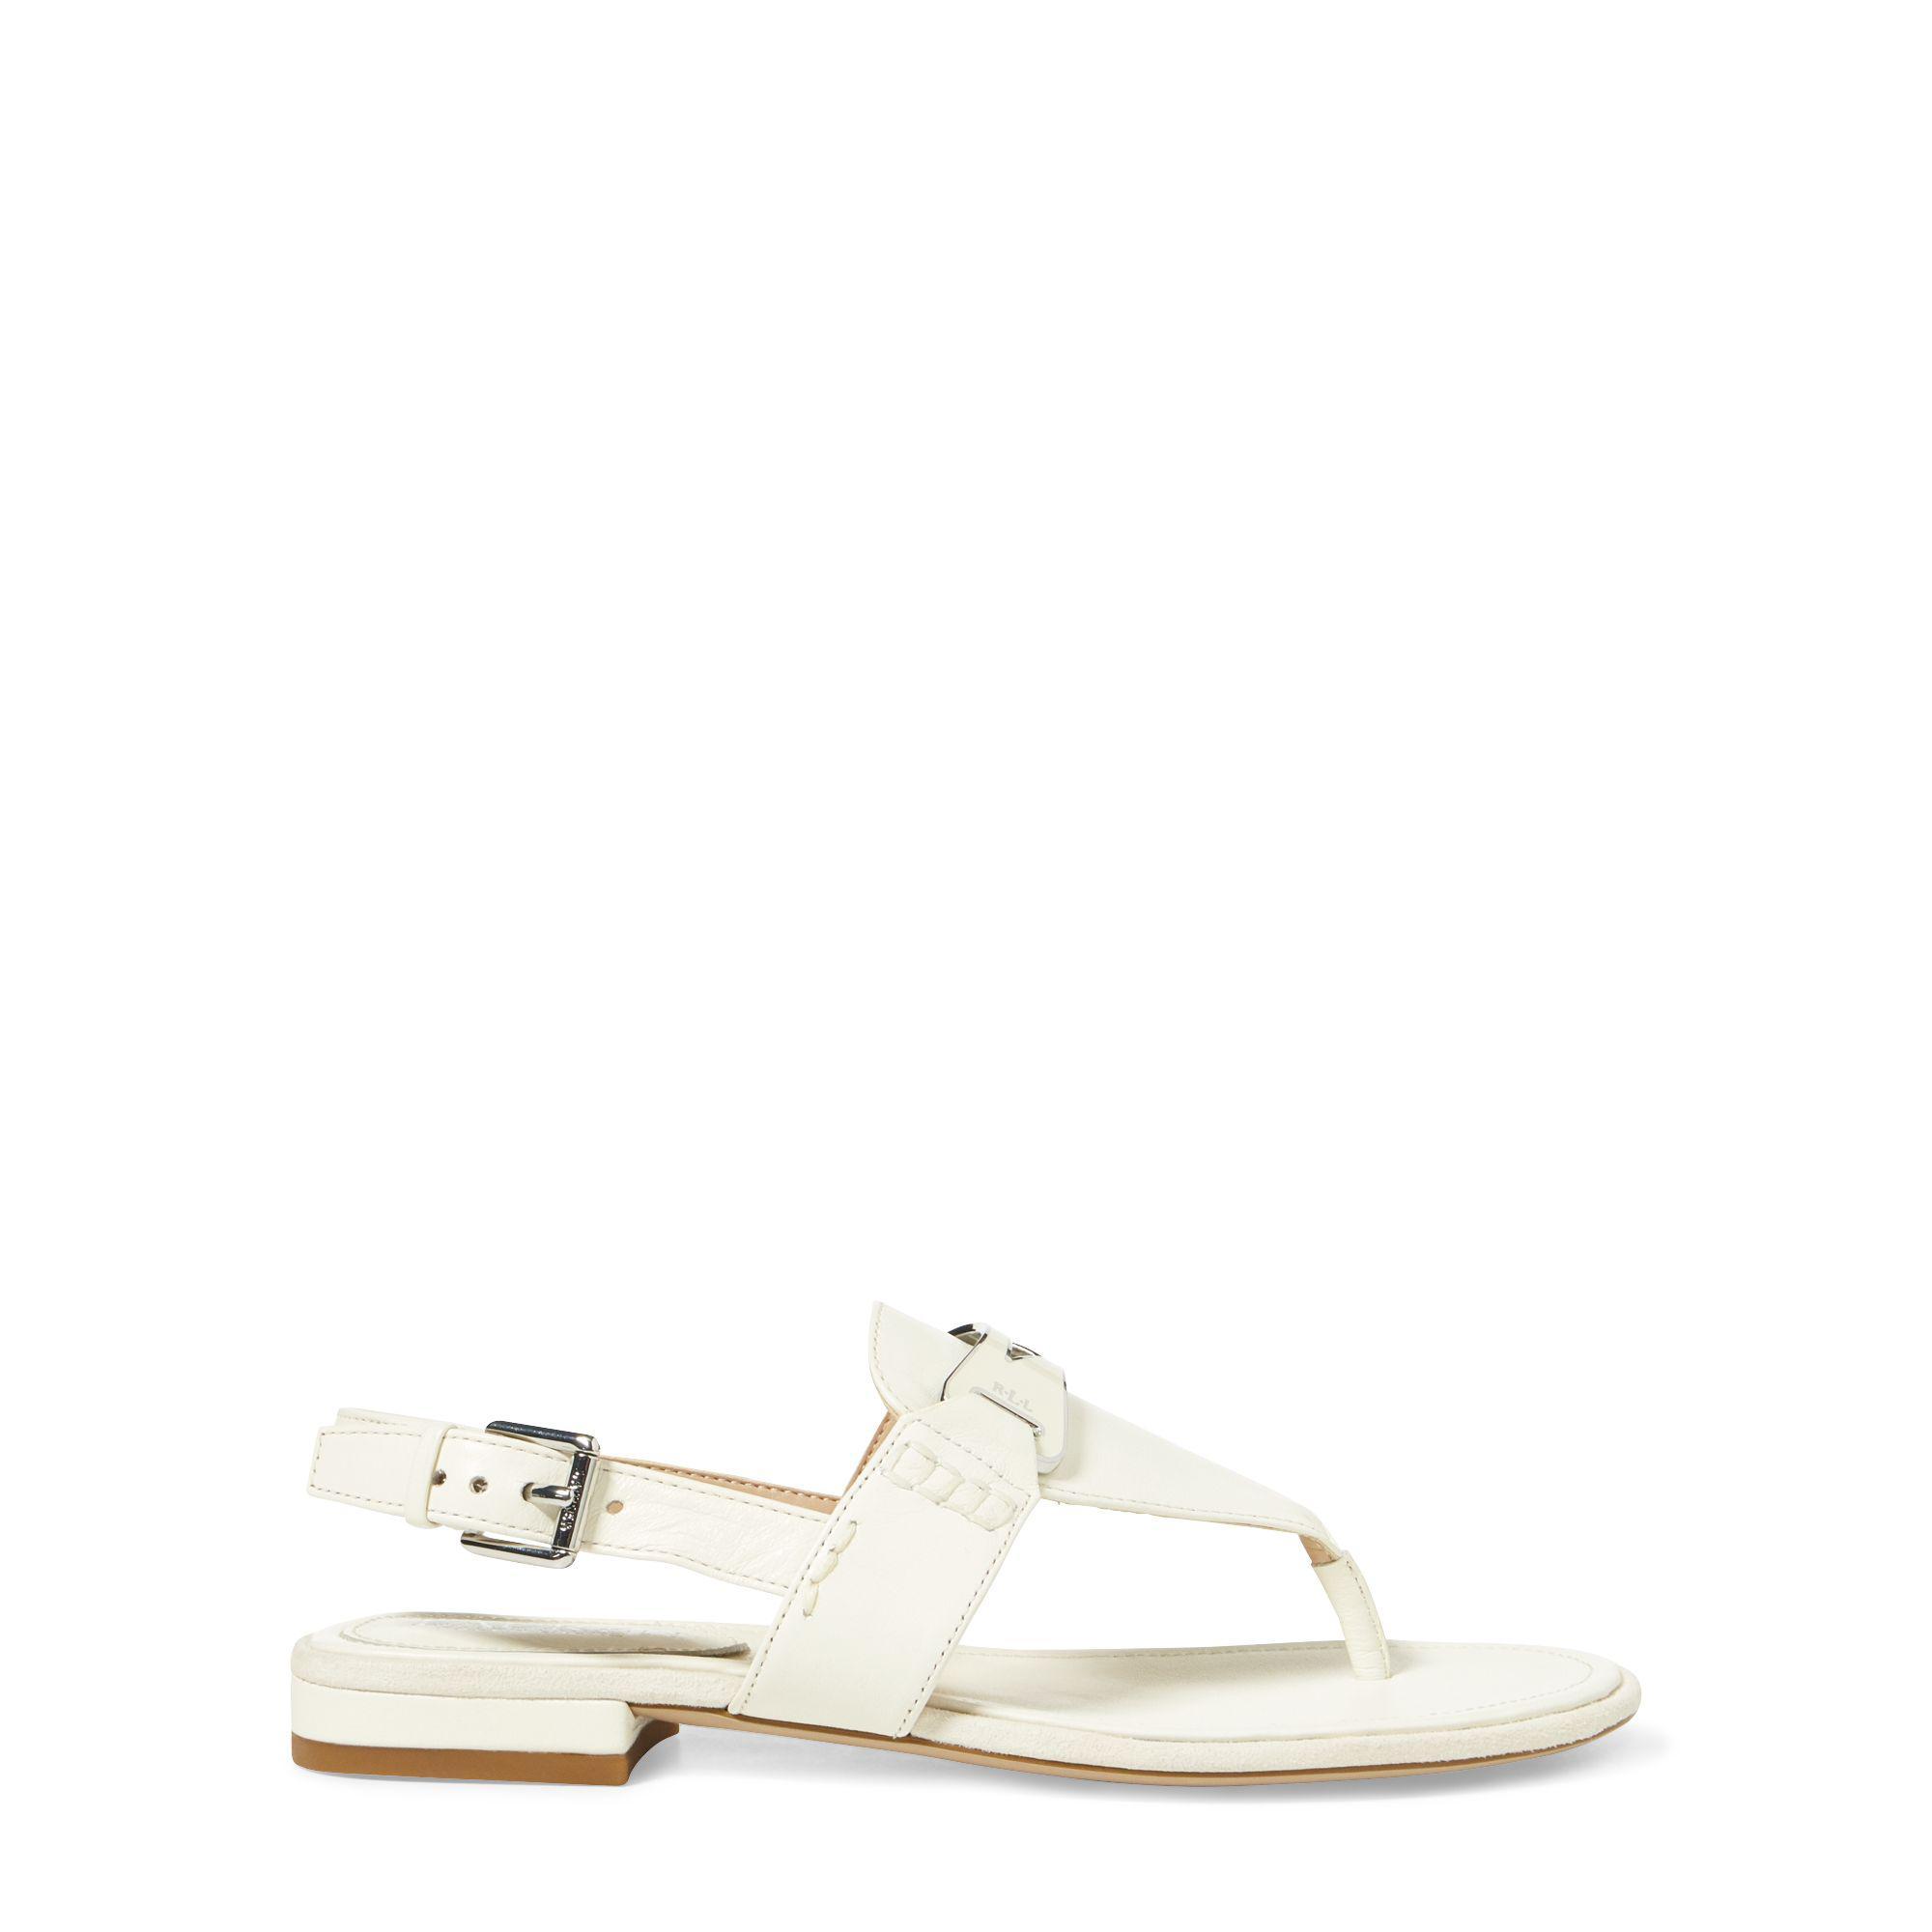 7dec78dd68c3 Ralph Lauren Dayna Leather Thong Sandal - Lyst